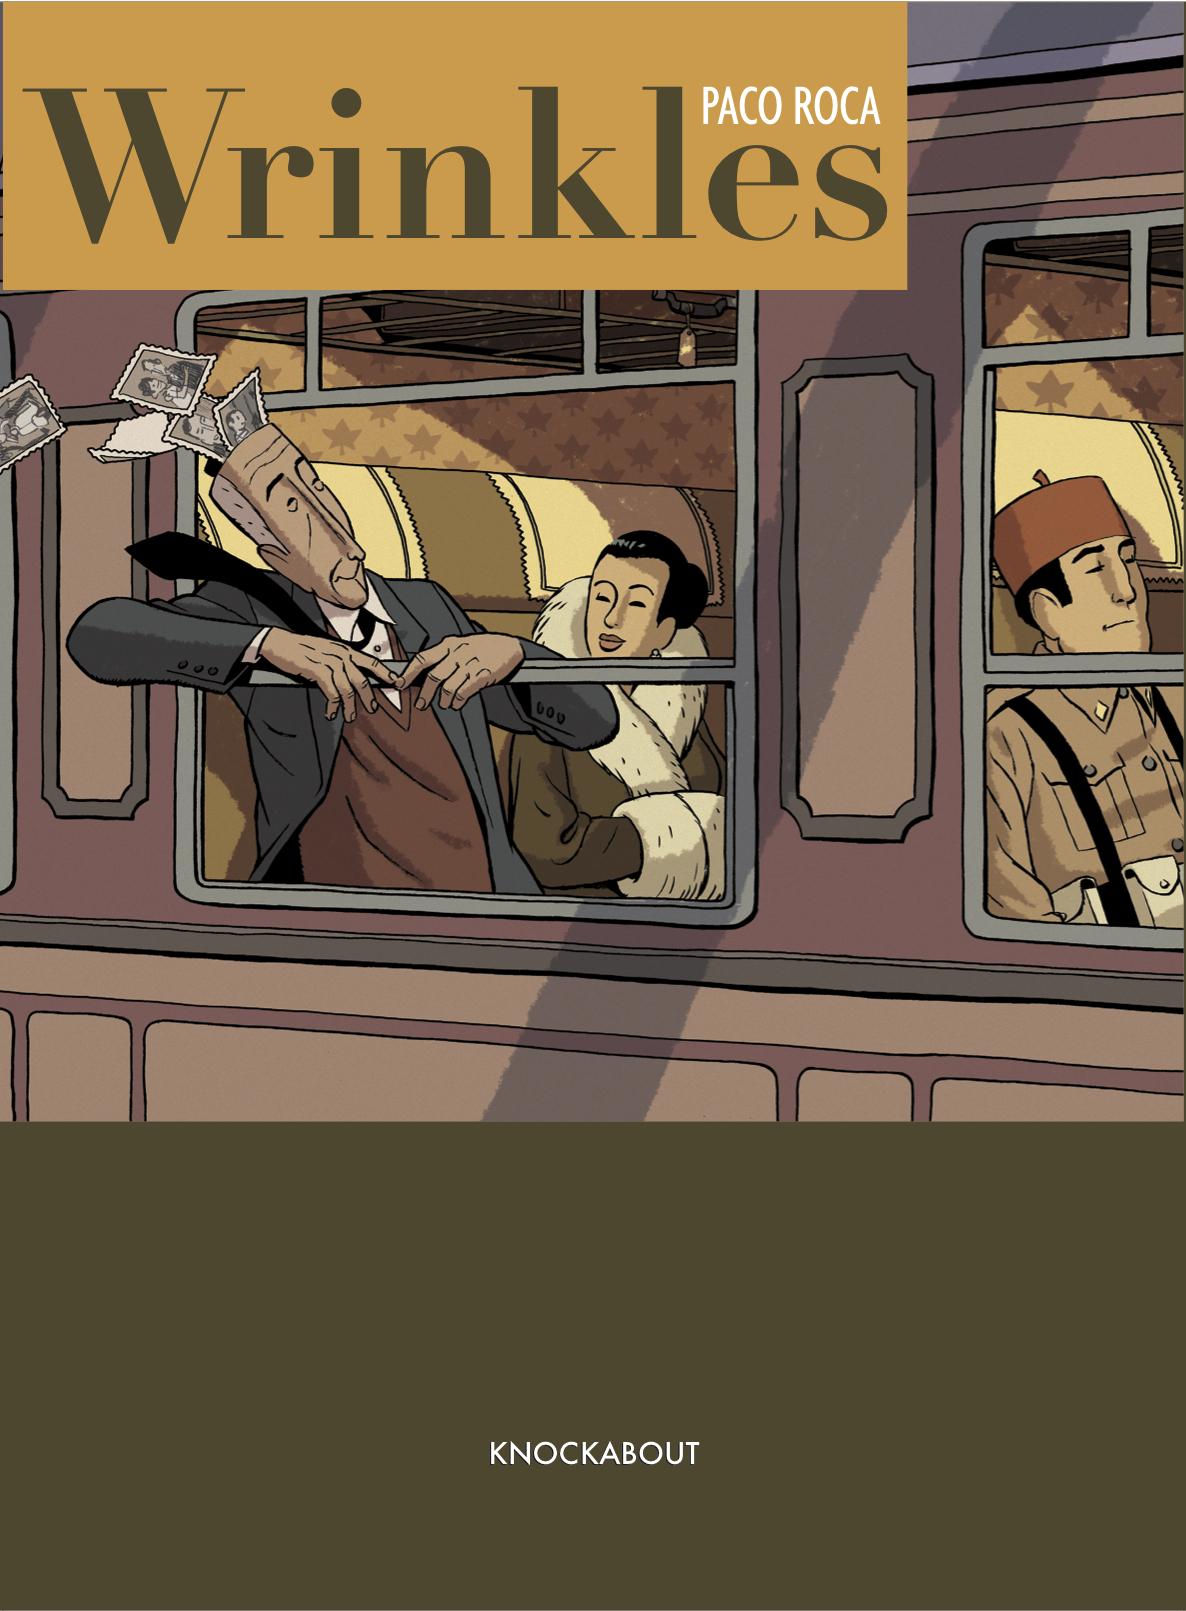 Wrinkles by Paco Roca